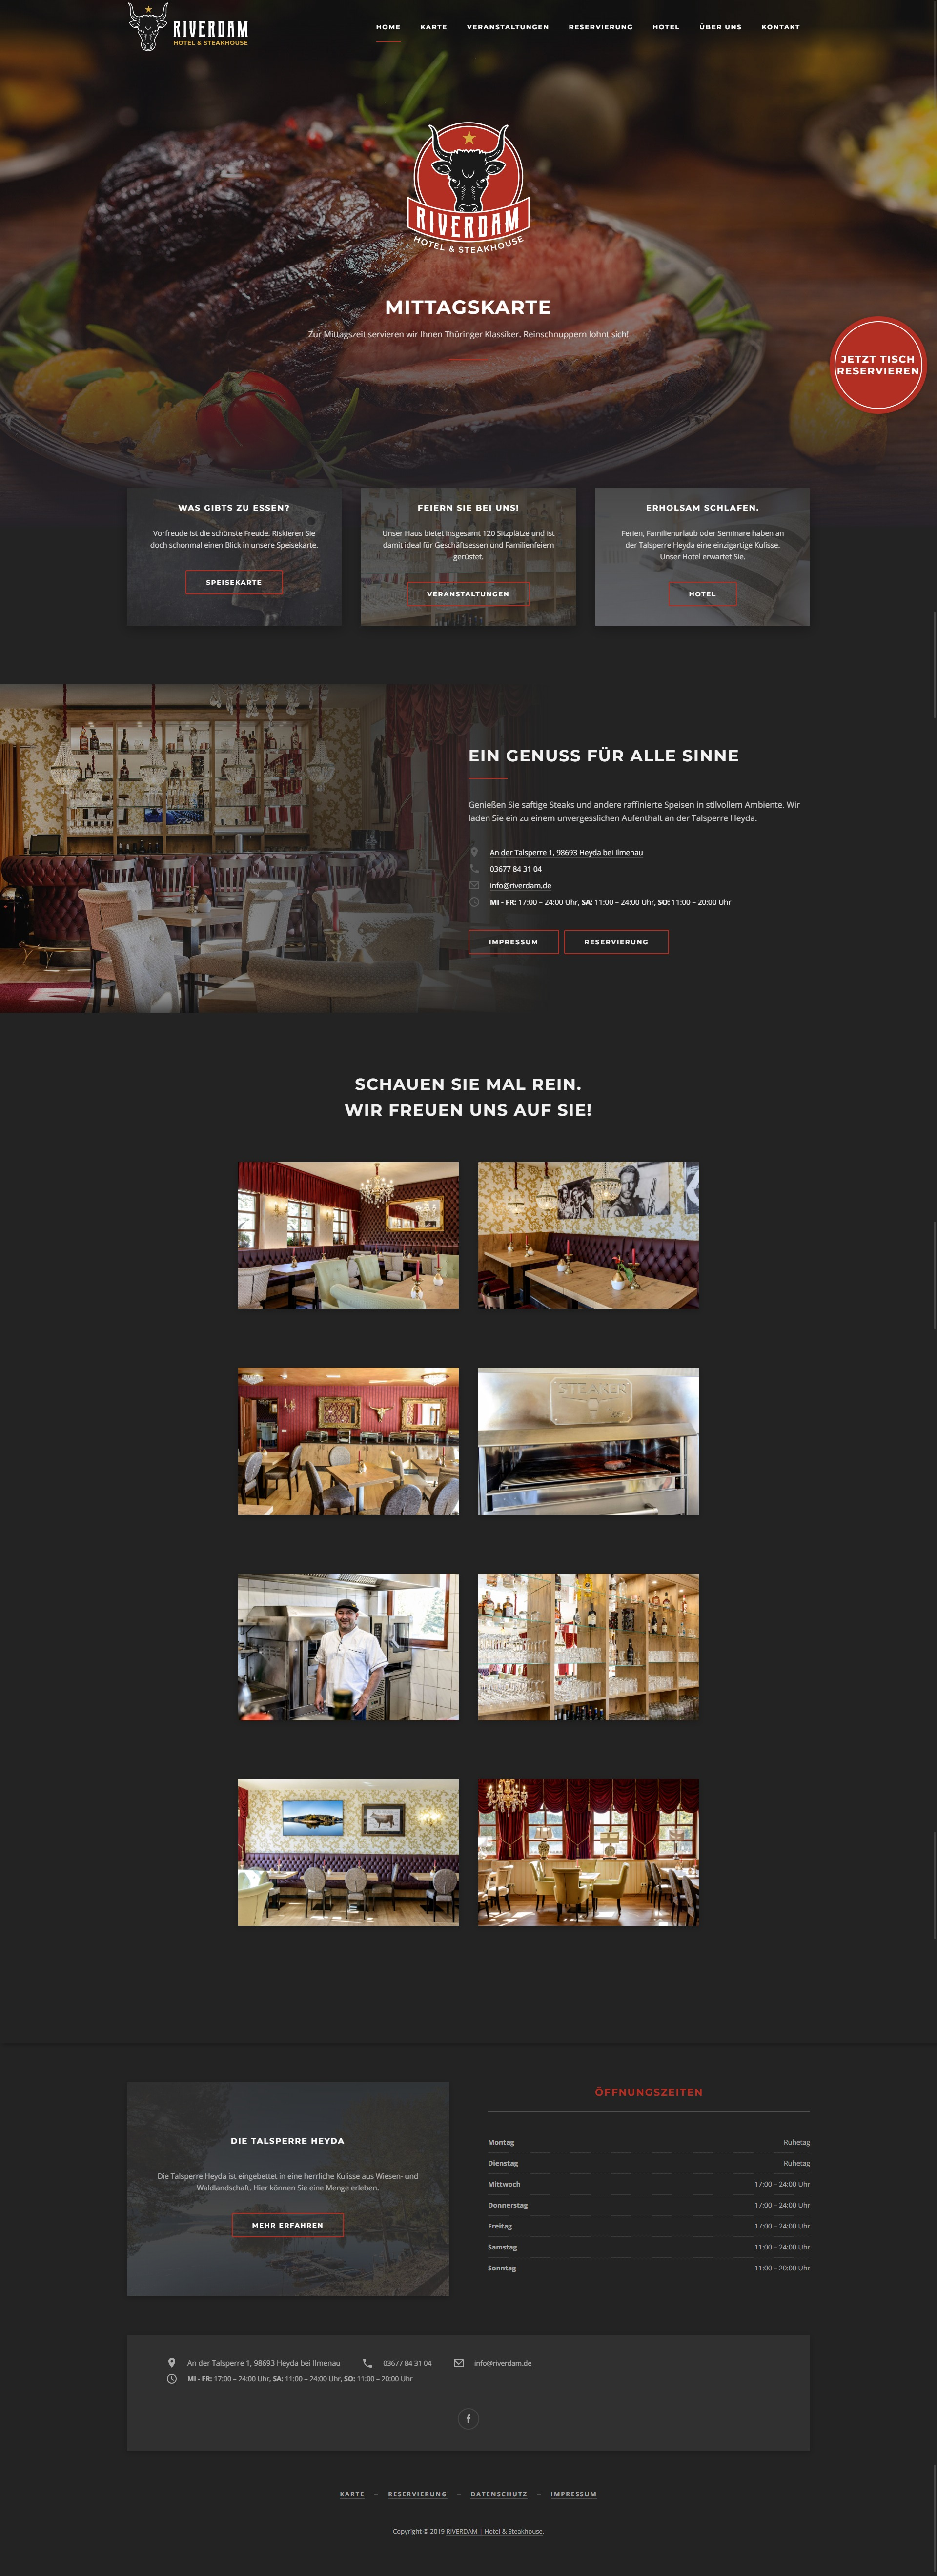 Riverdam Hotel & Steakhouse Website